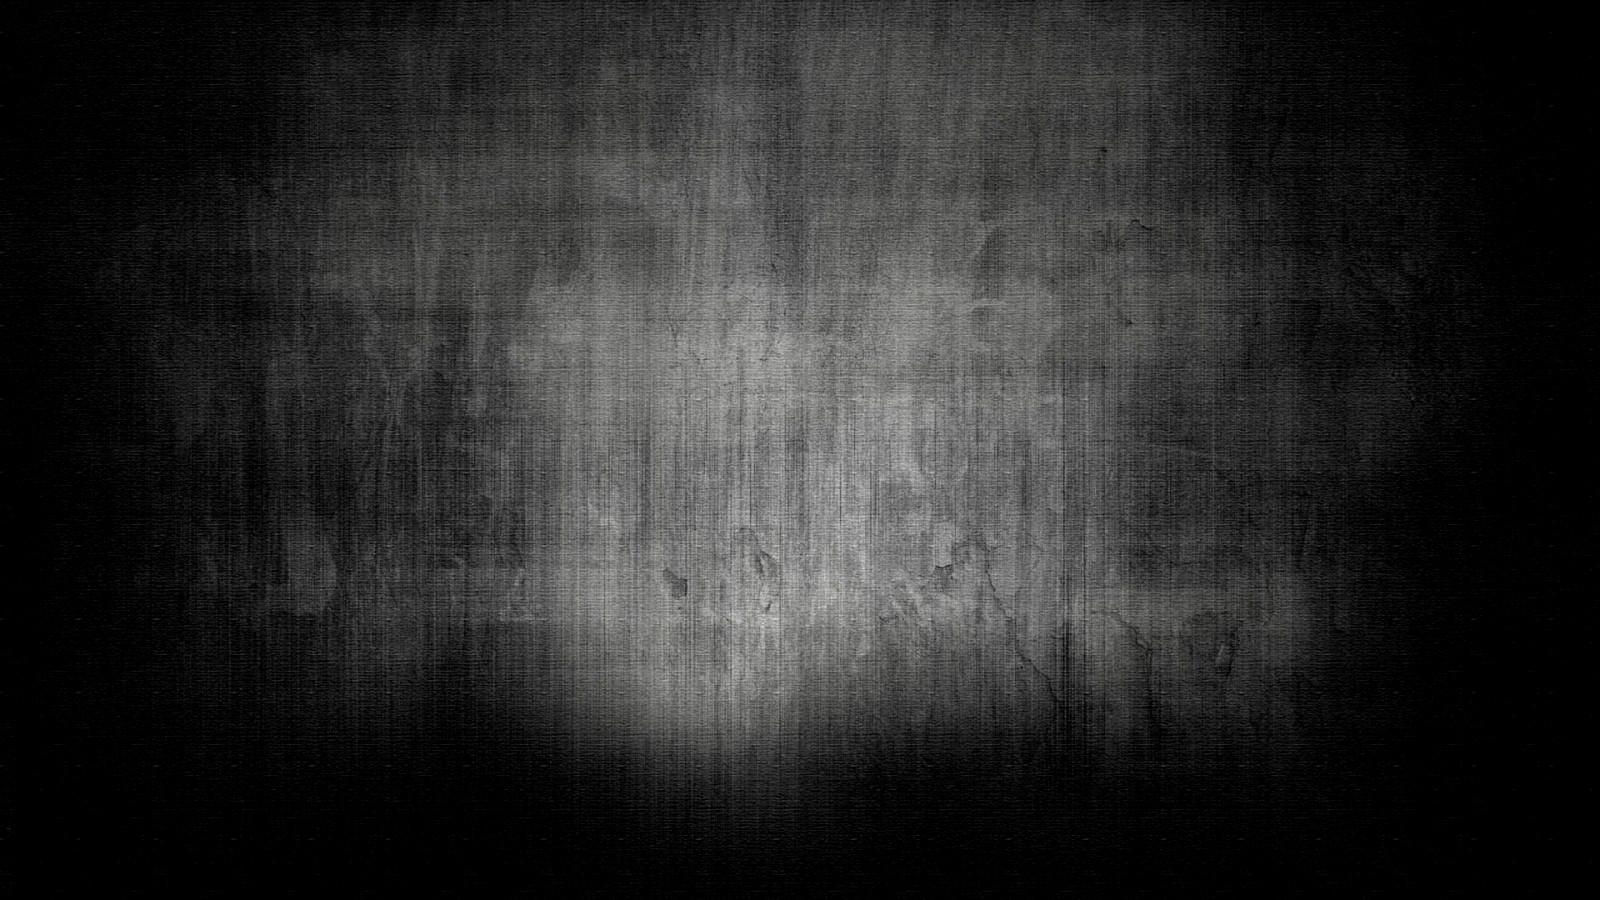 orgwp contentuploads201306Texture Background Dark Spot HDjpg 1600x900